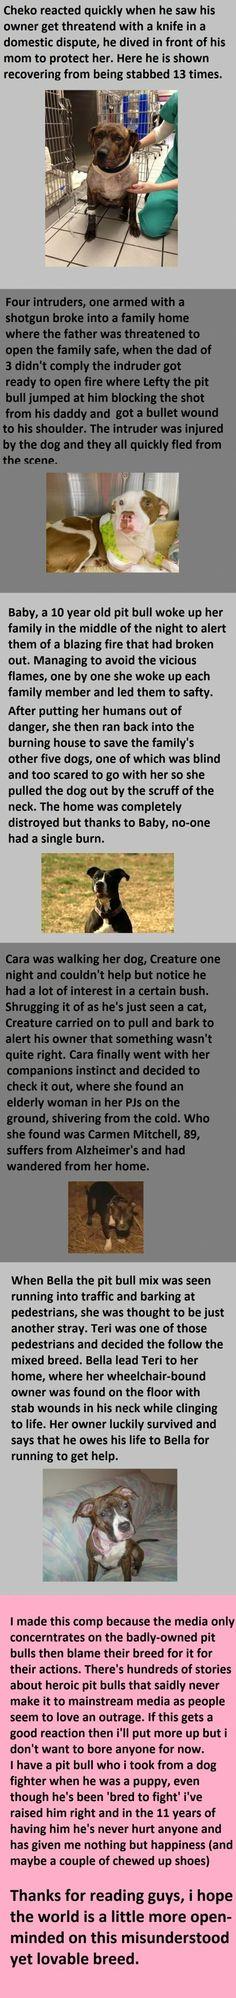 Warum man Hunde man einfach lieben muss - Win Bild | Webfail - Fail Bilder und Fail Videos